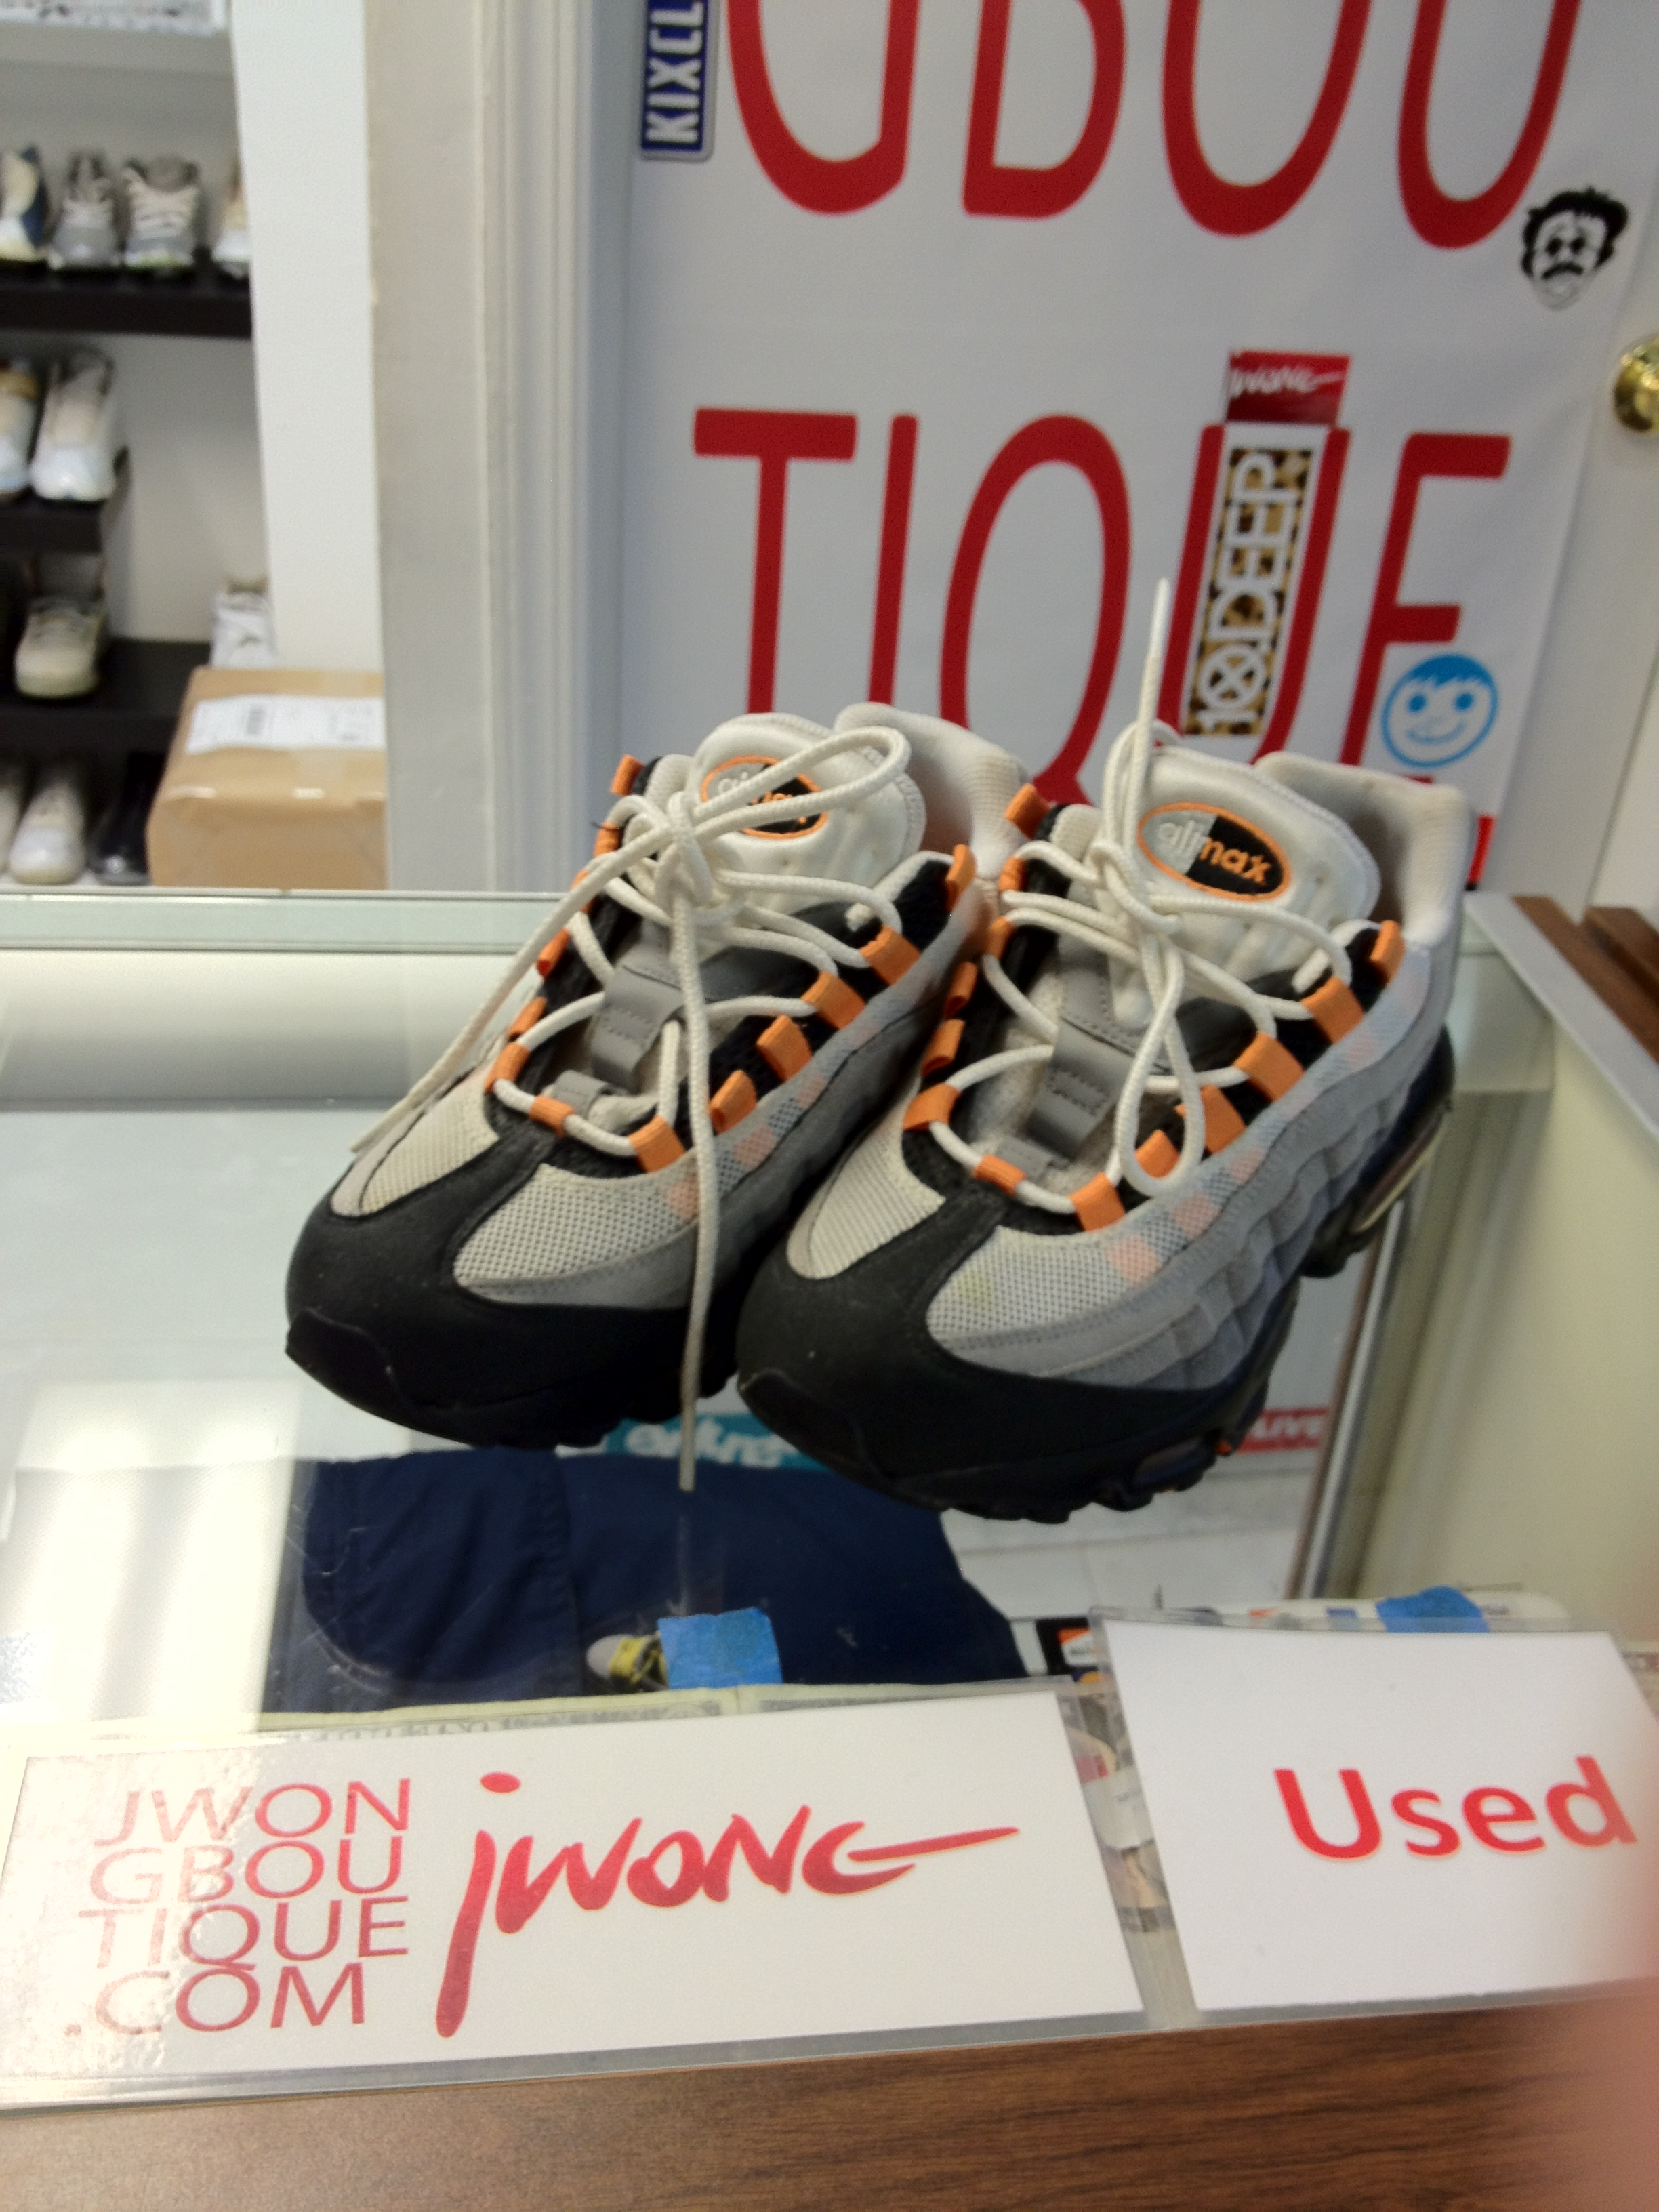 how to buy dirt cheap professional sale 2011 Nike Air Max 95 Bright Mandarin